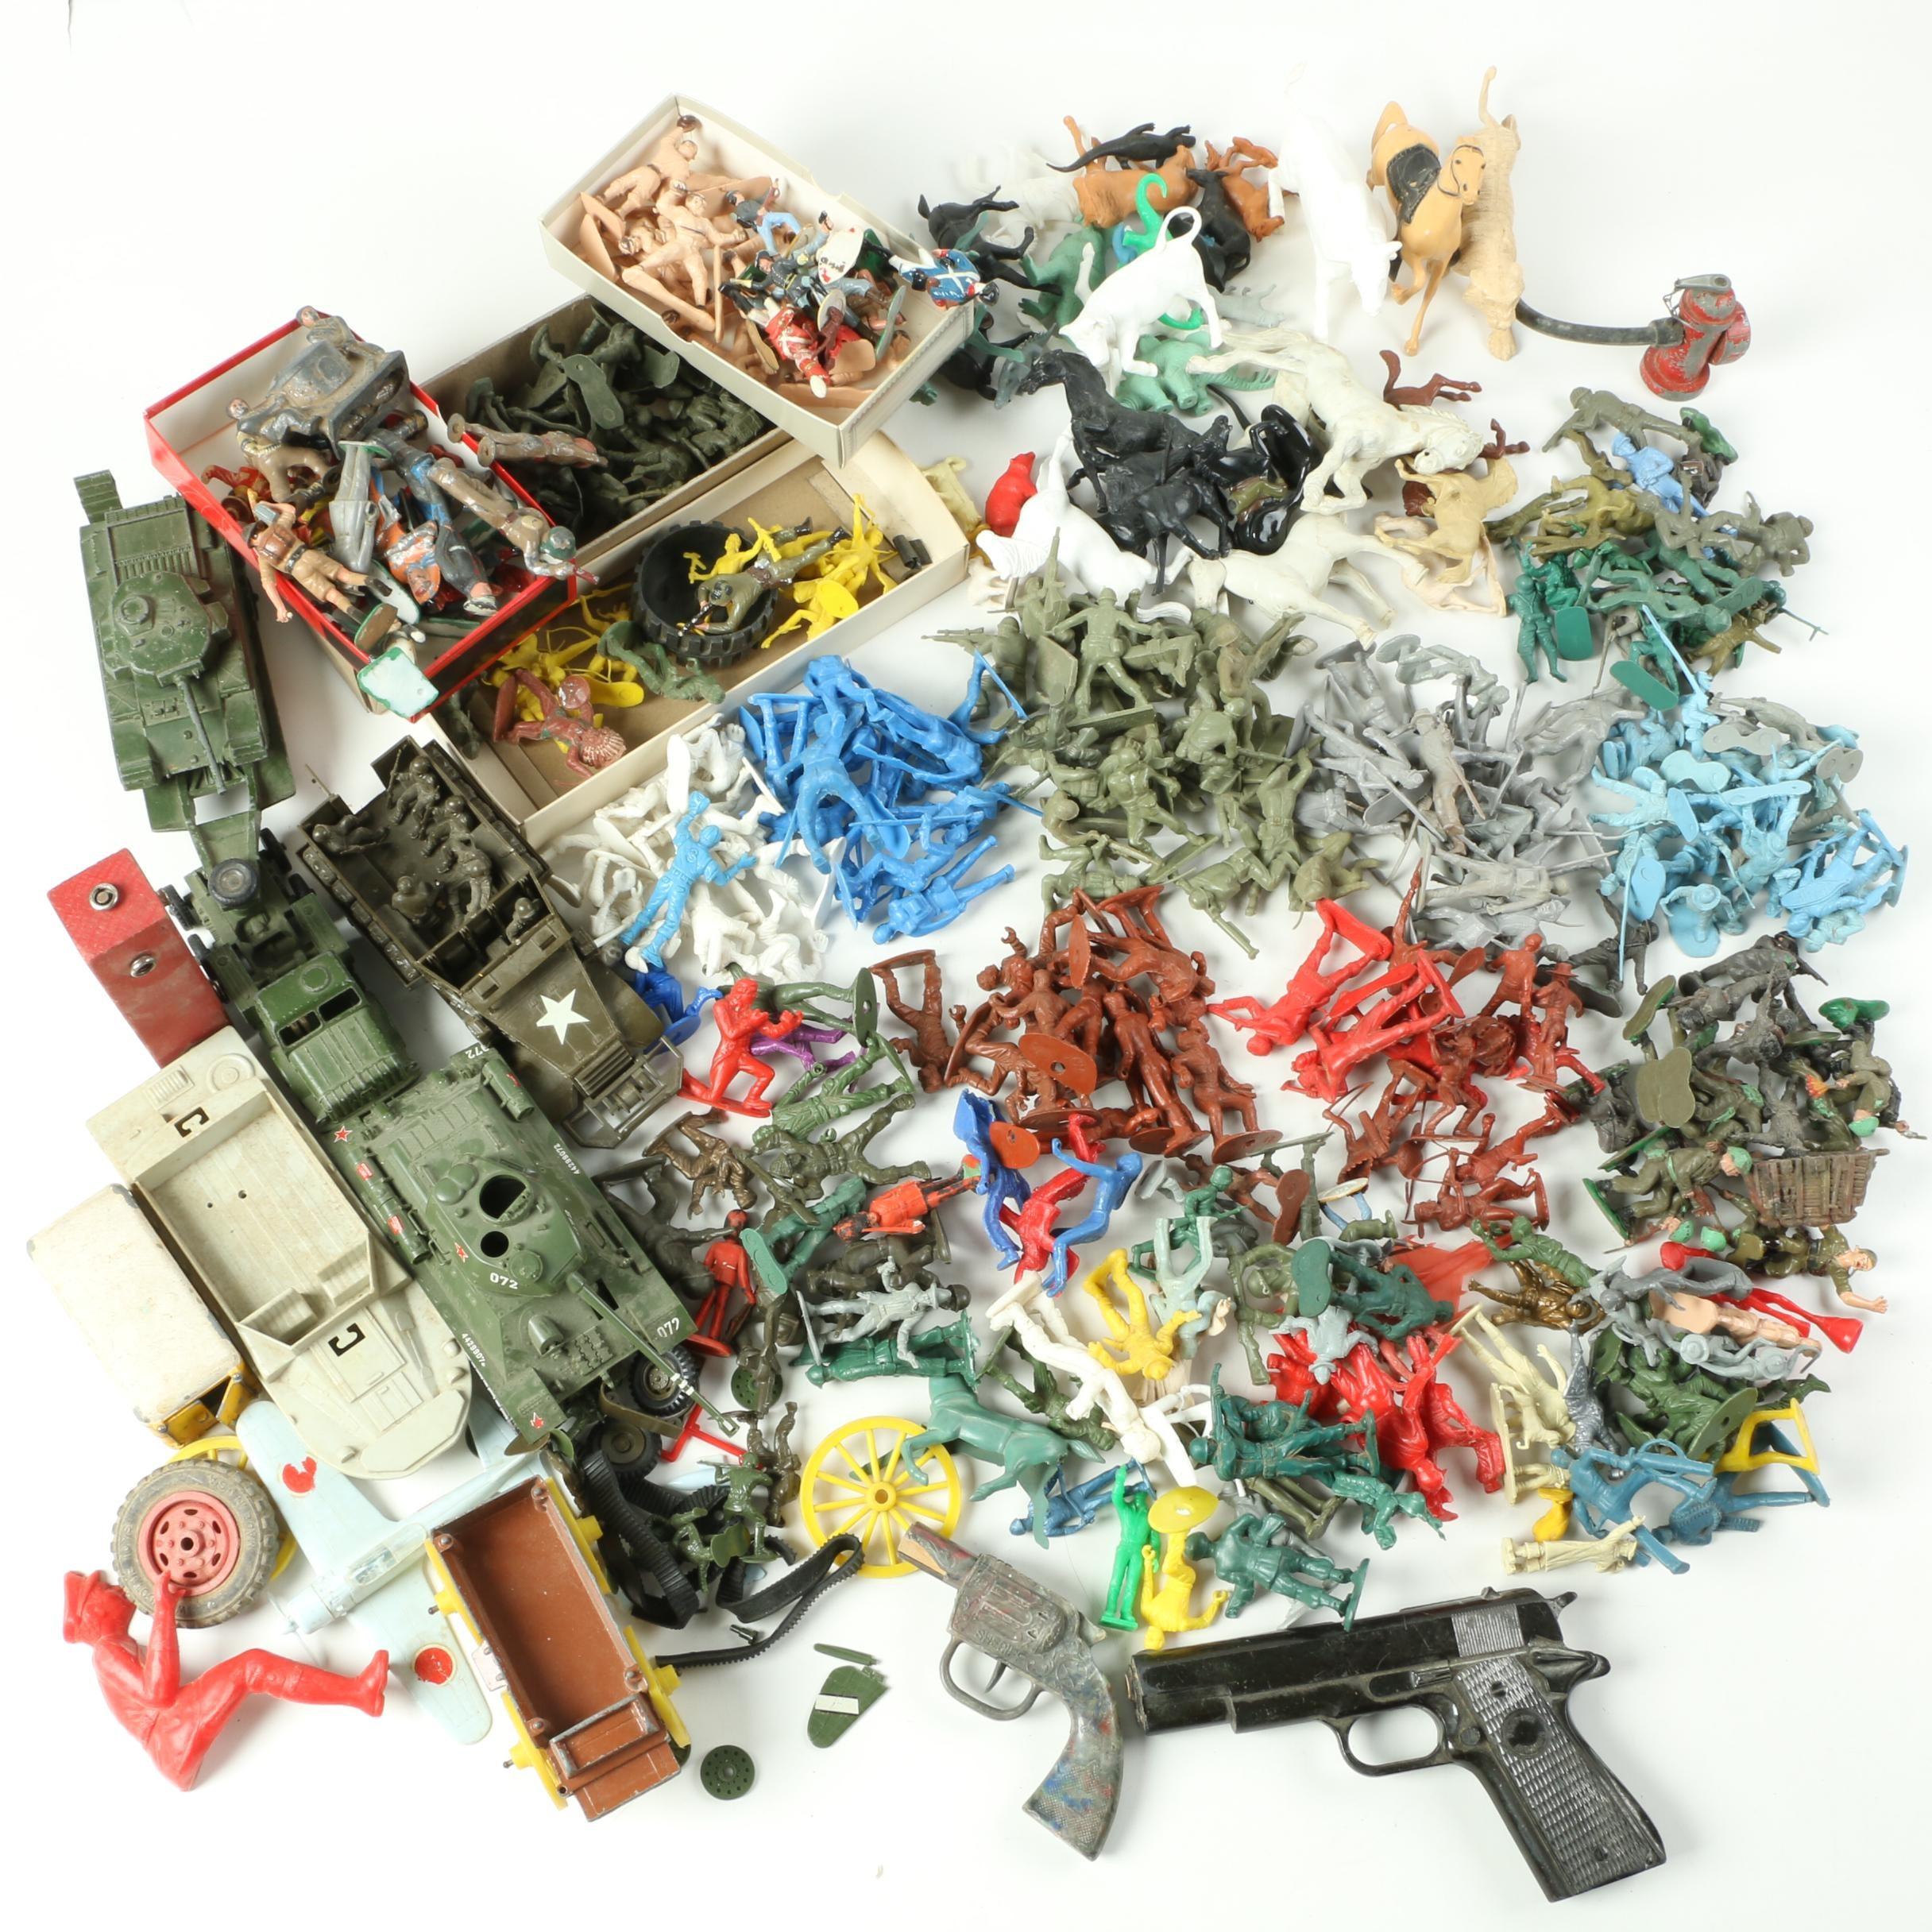 Large Toy Assortment